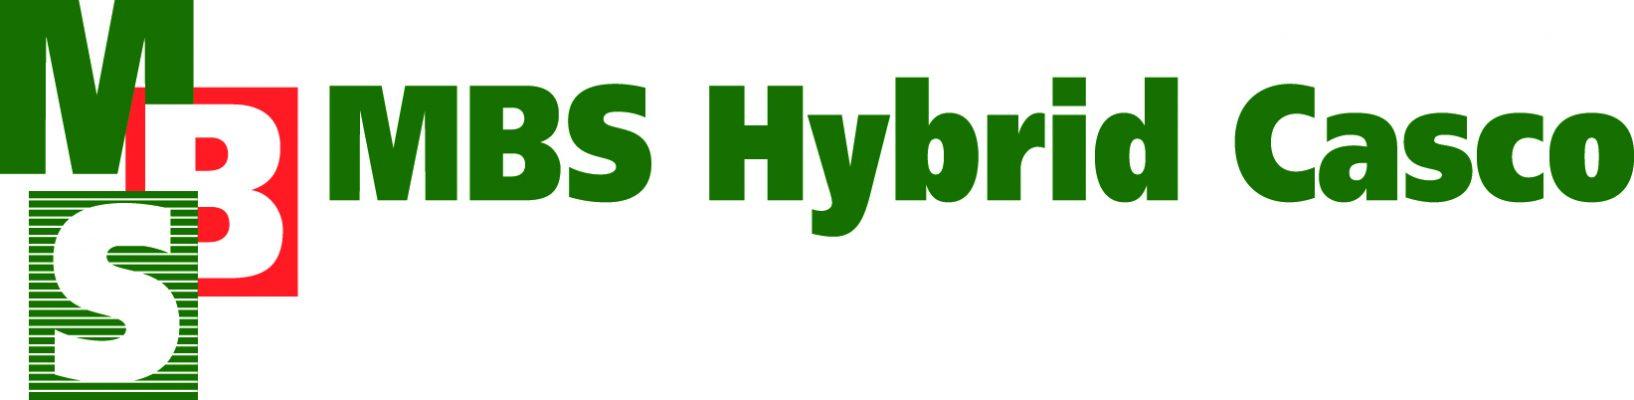 MBS Hybrid Casco